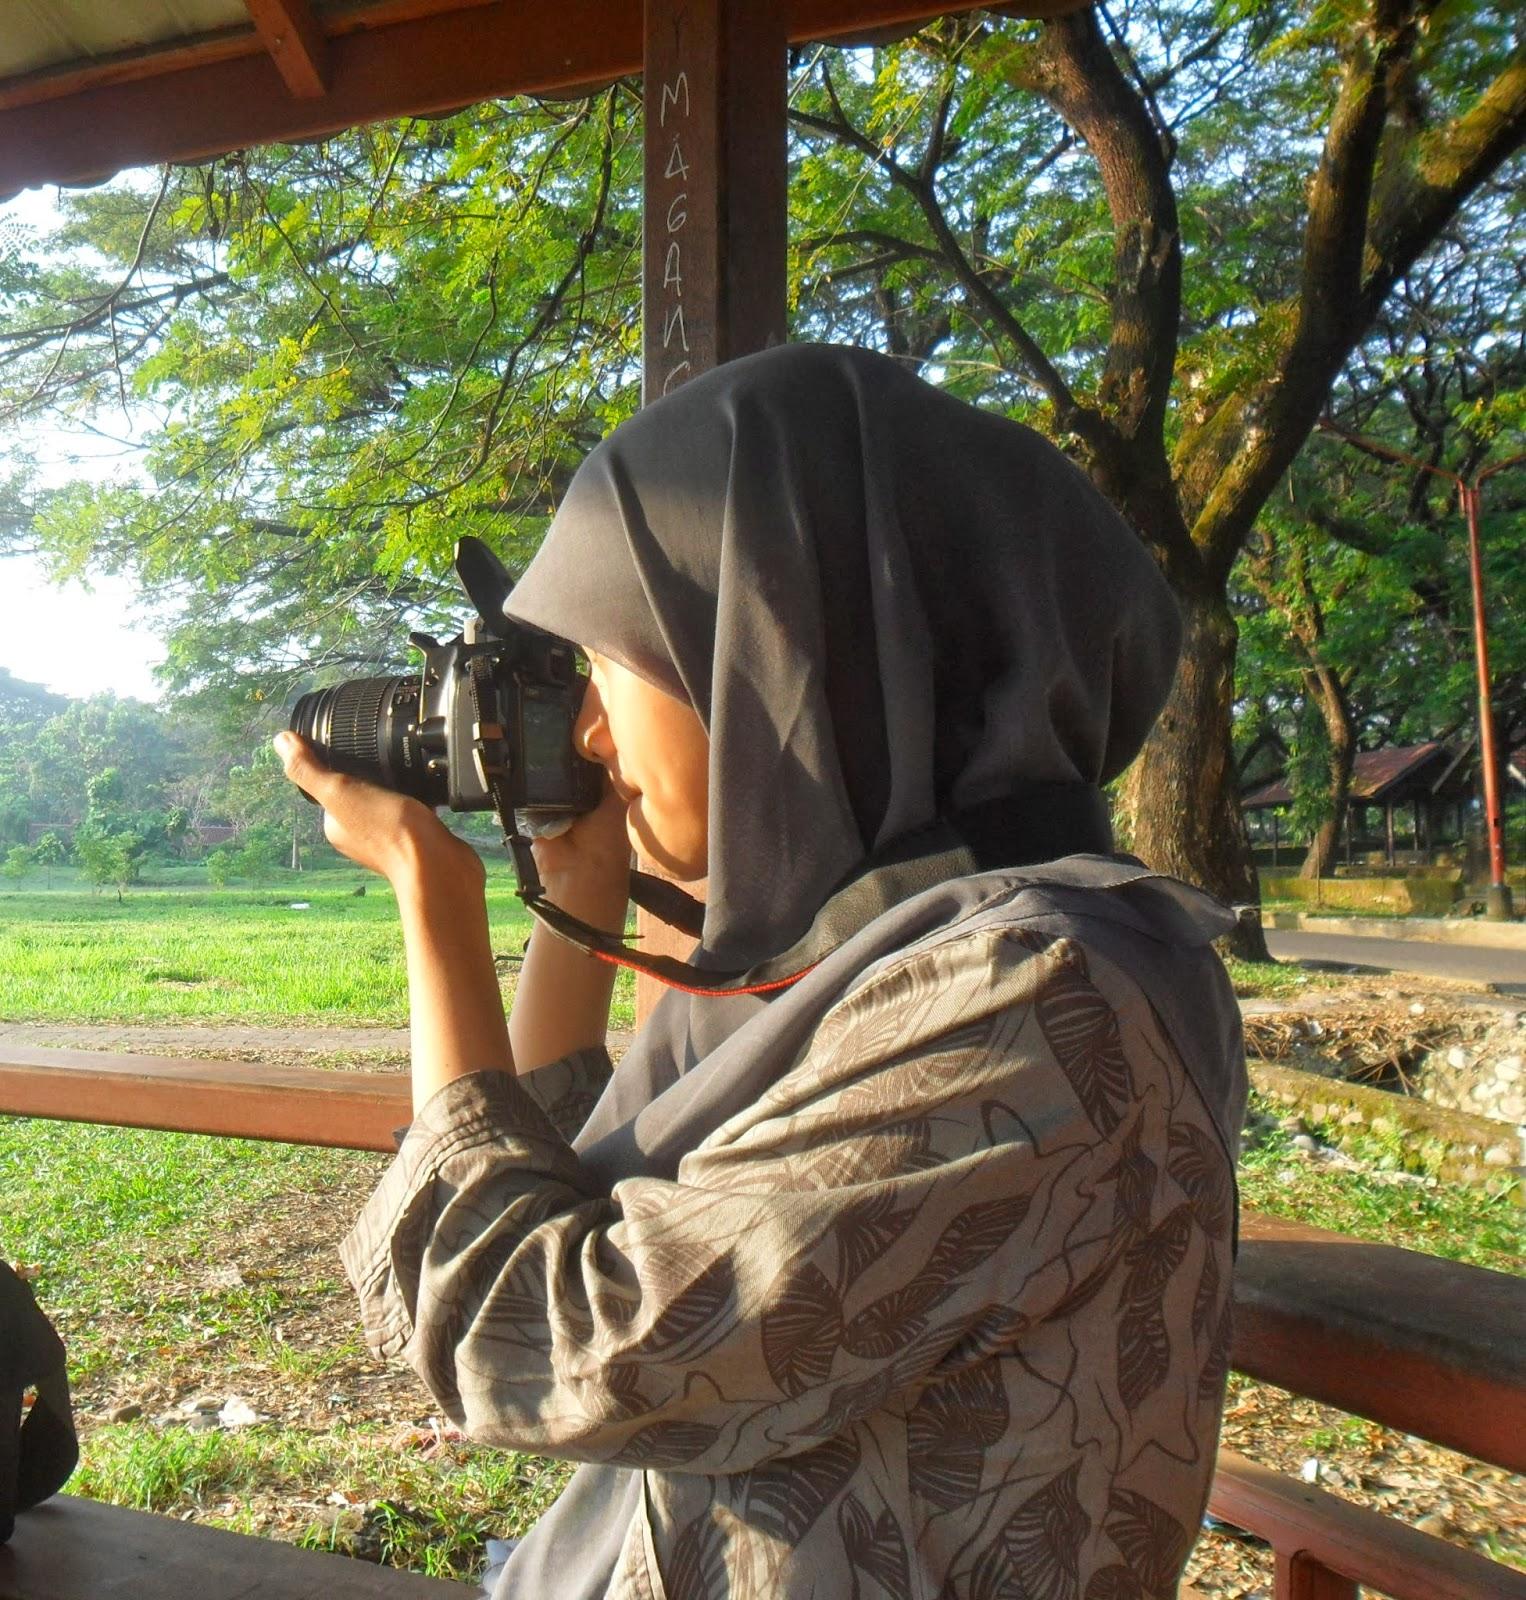 Menjadi Fotografer - 4.bp.blogspot.com